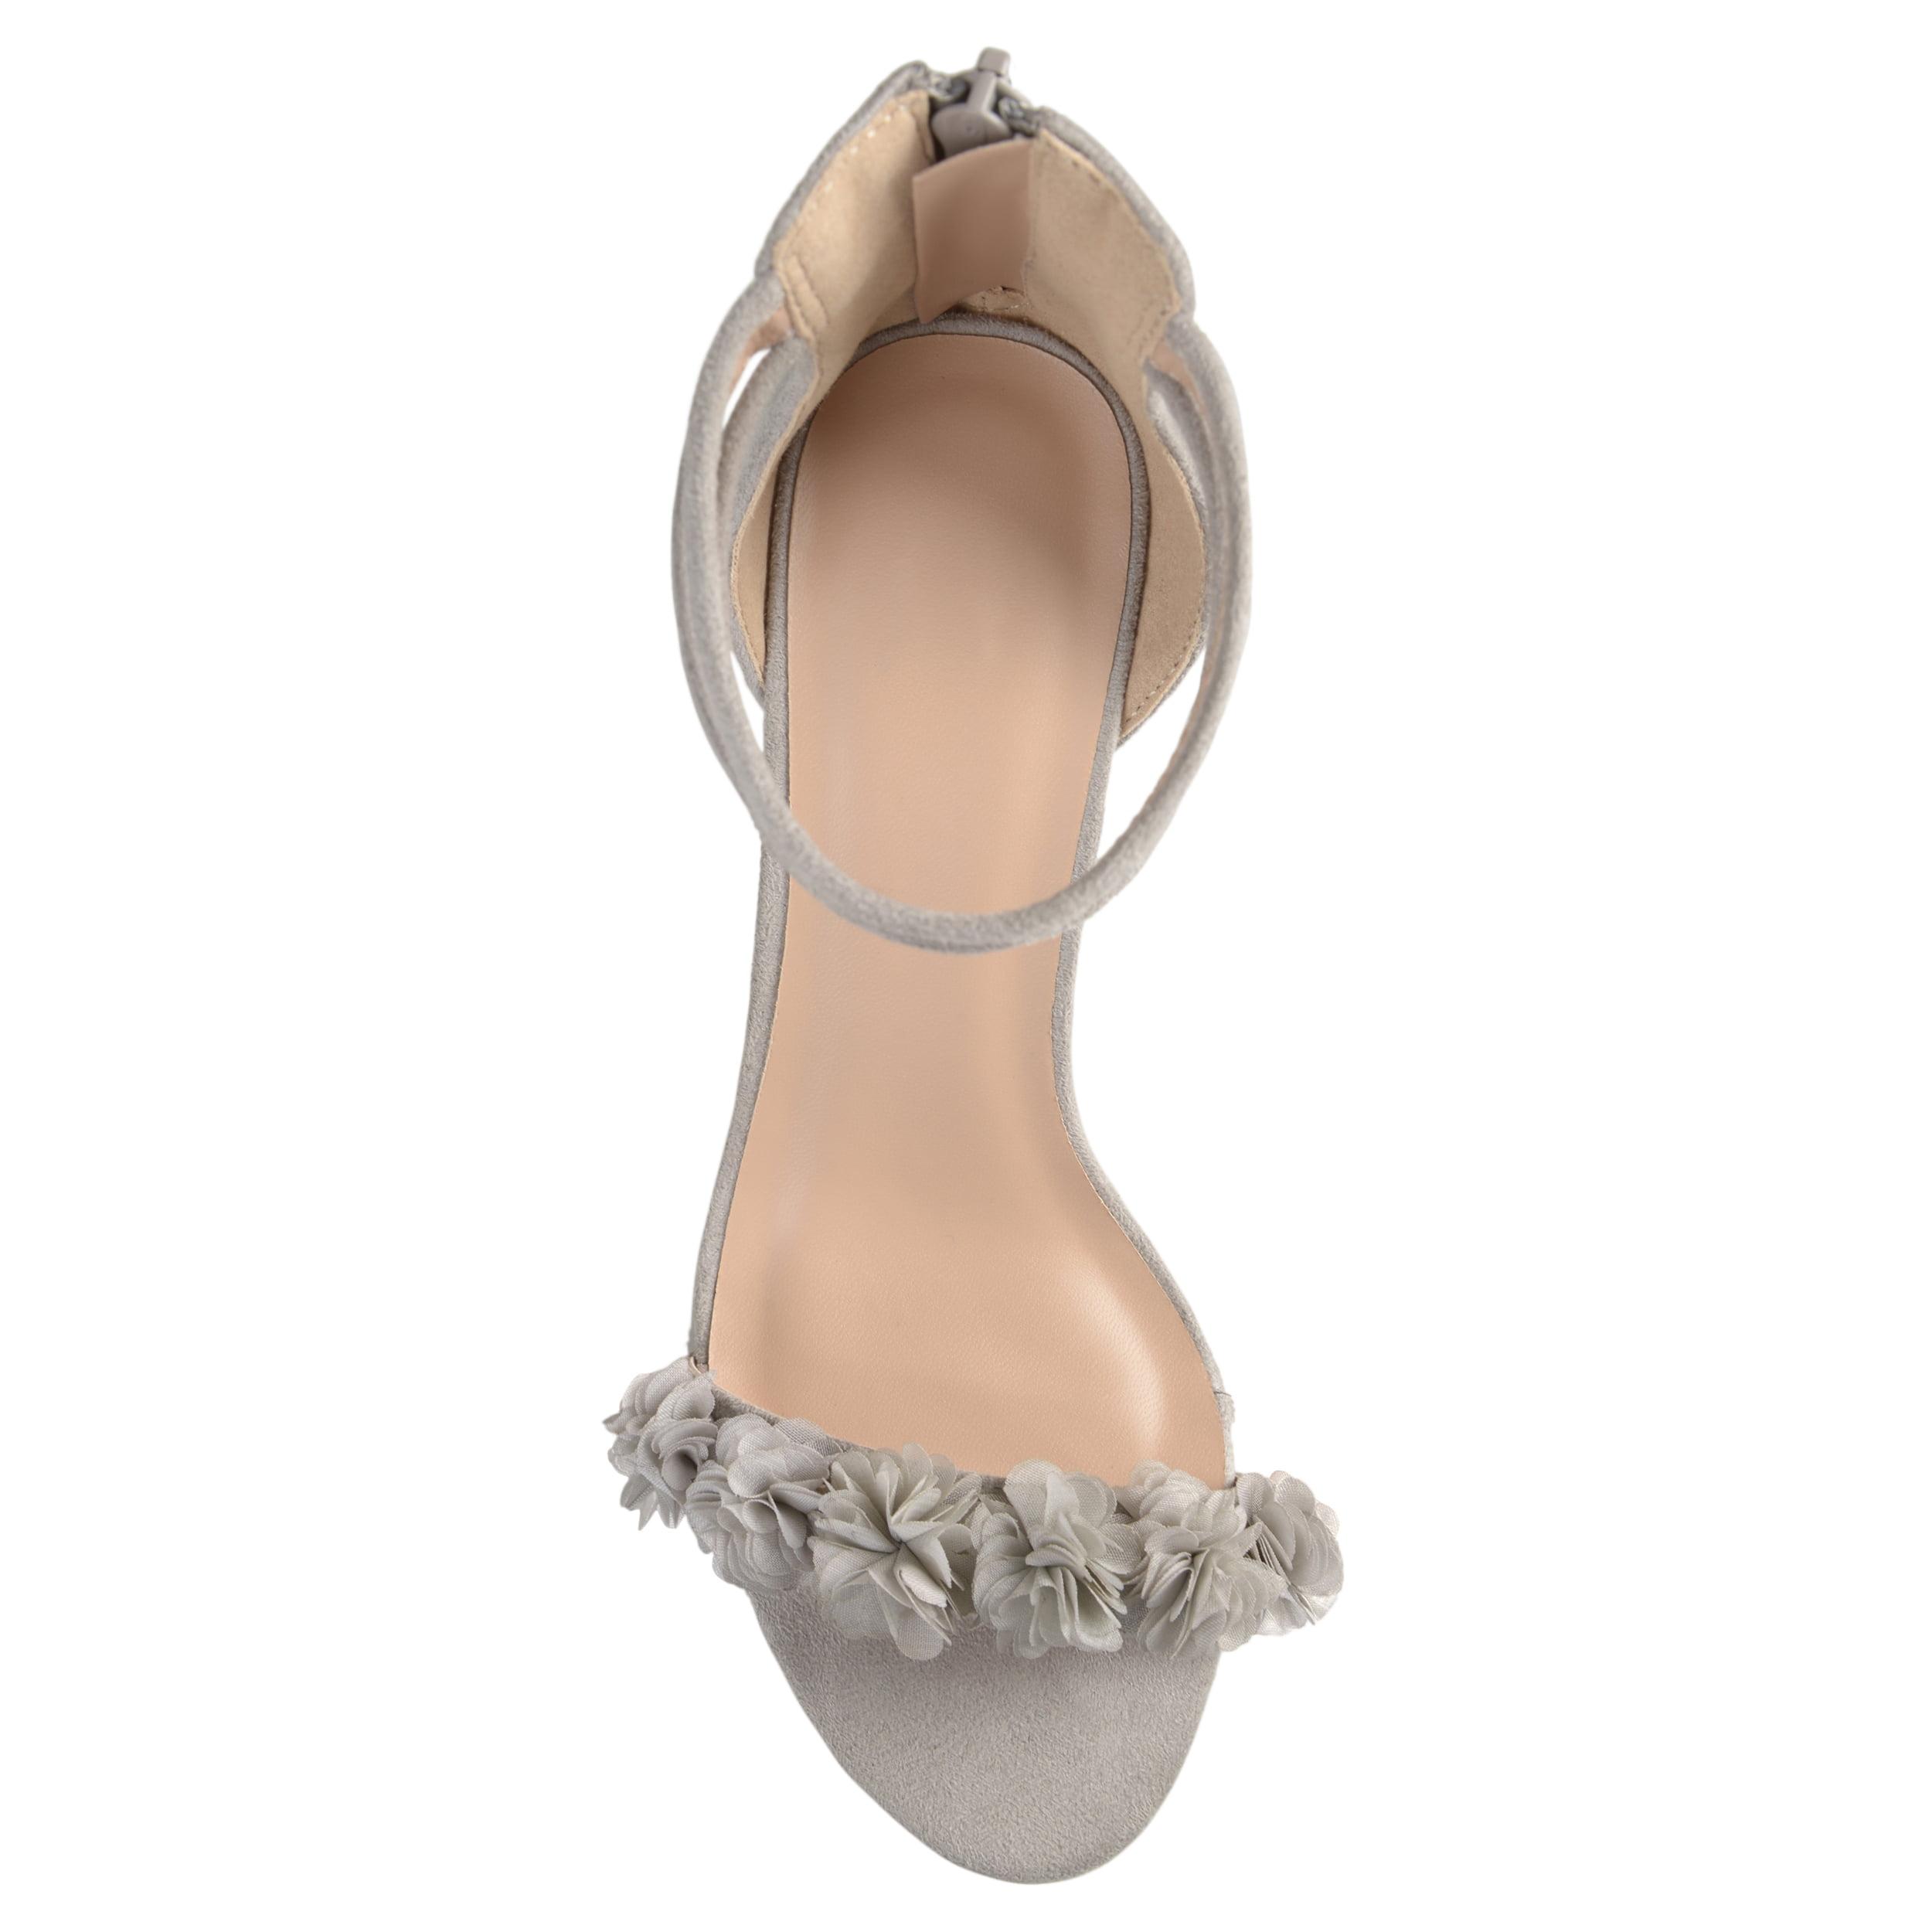 Brinley Flower Co. Women's Faux Suede Flower Brinley Ankle Strap High Heels 3bacff